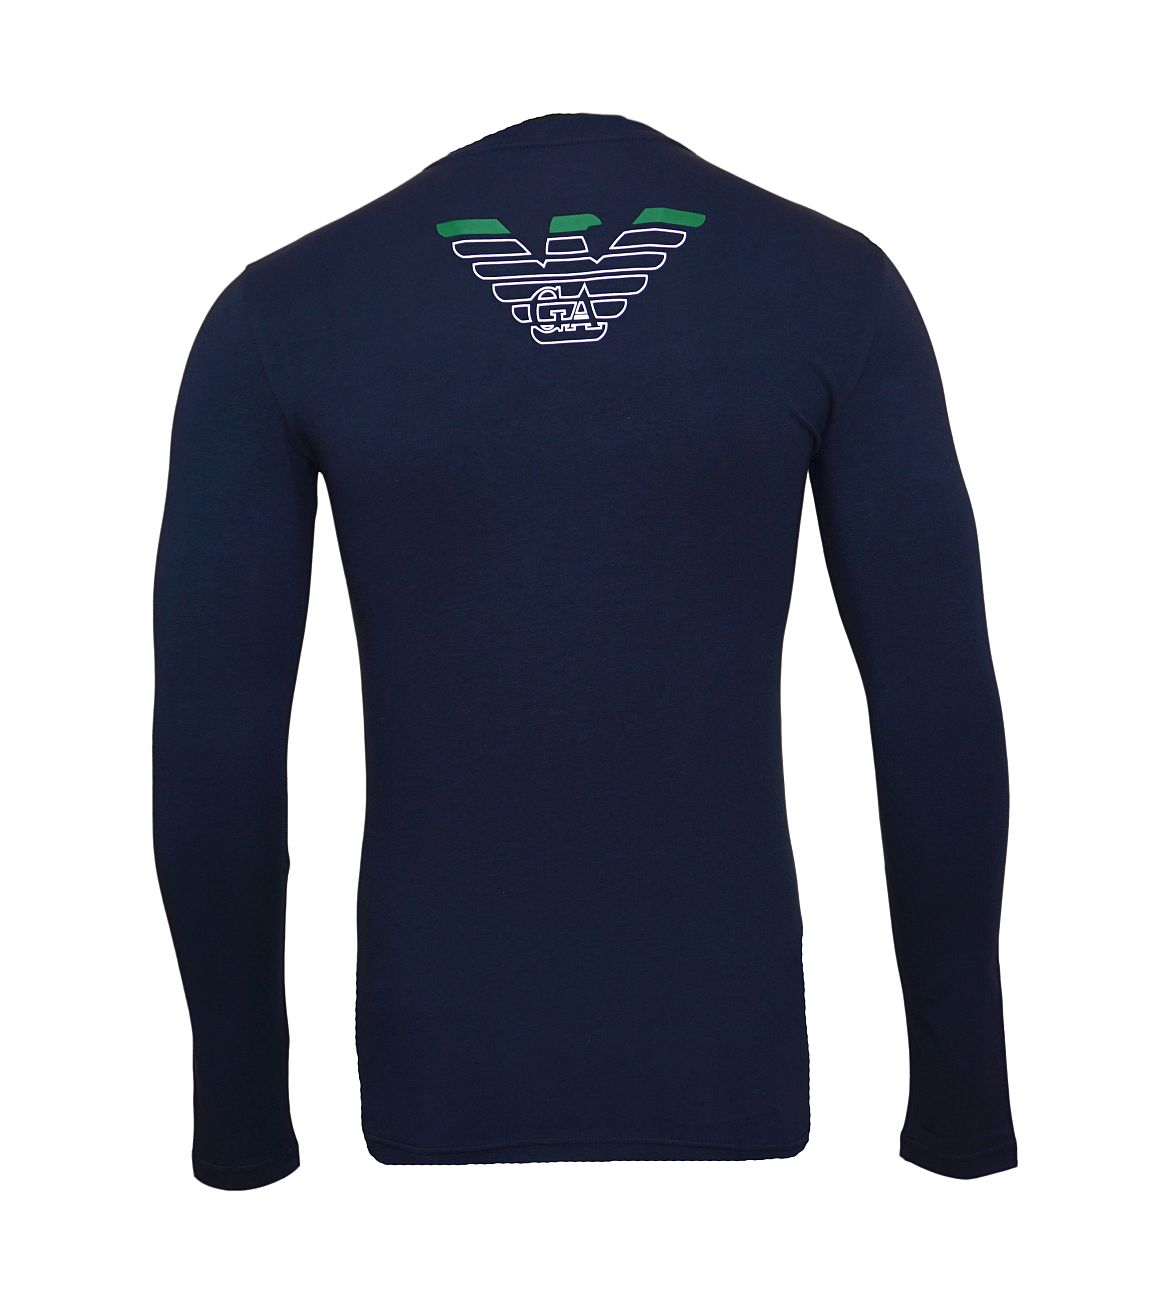 Emporio Armani Longsleeve Rundhals Shirt 111023 8A725 00135 MARINE WX18-EAL